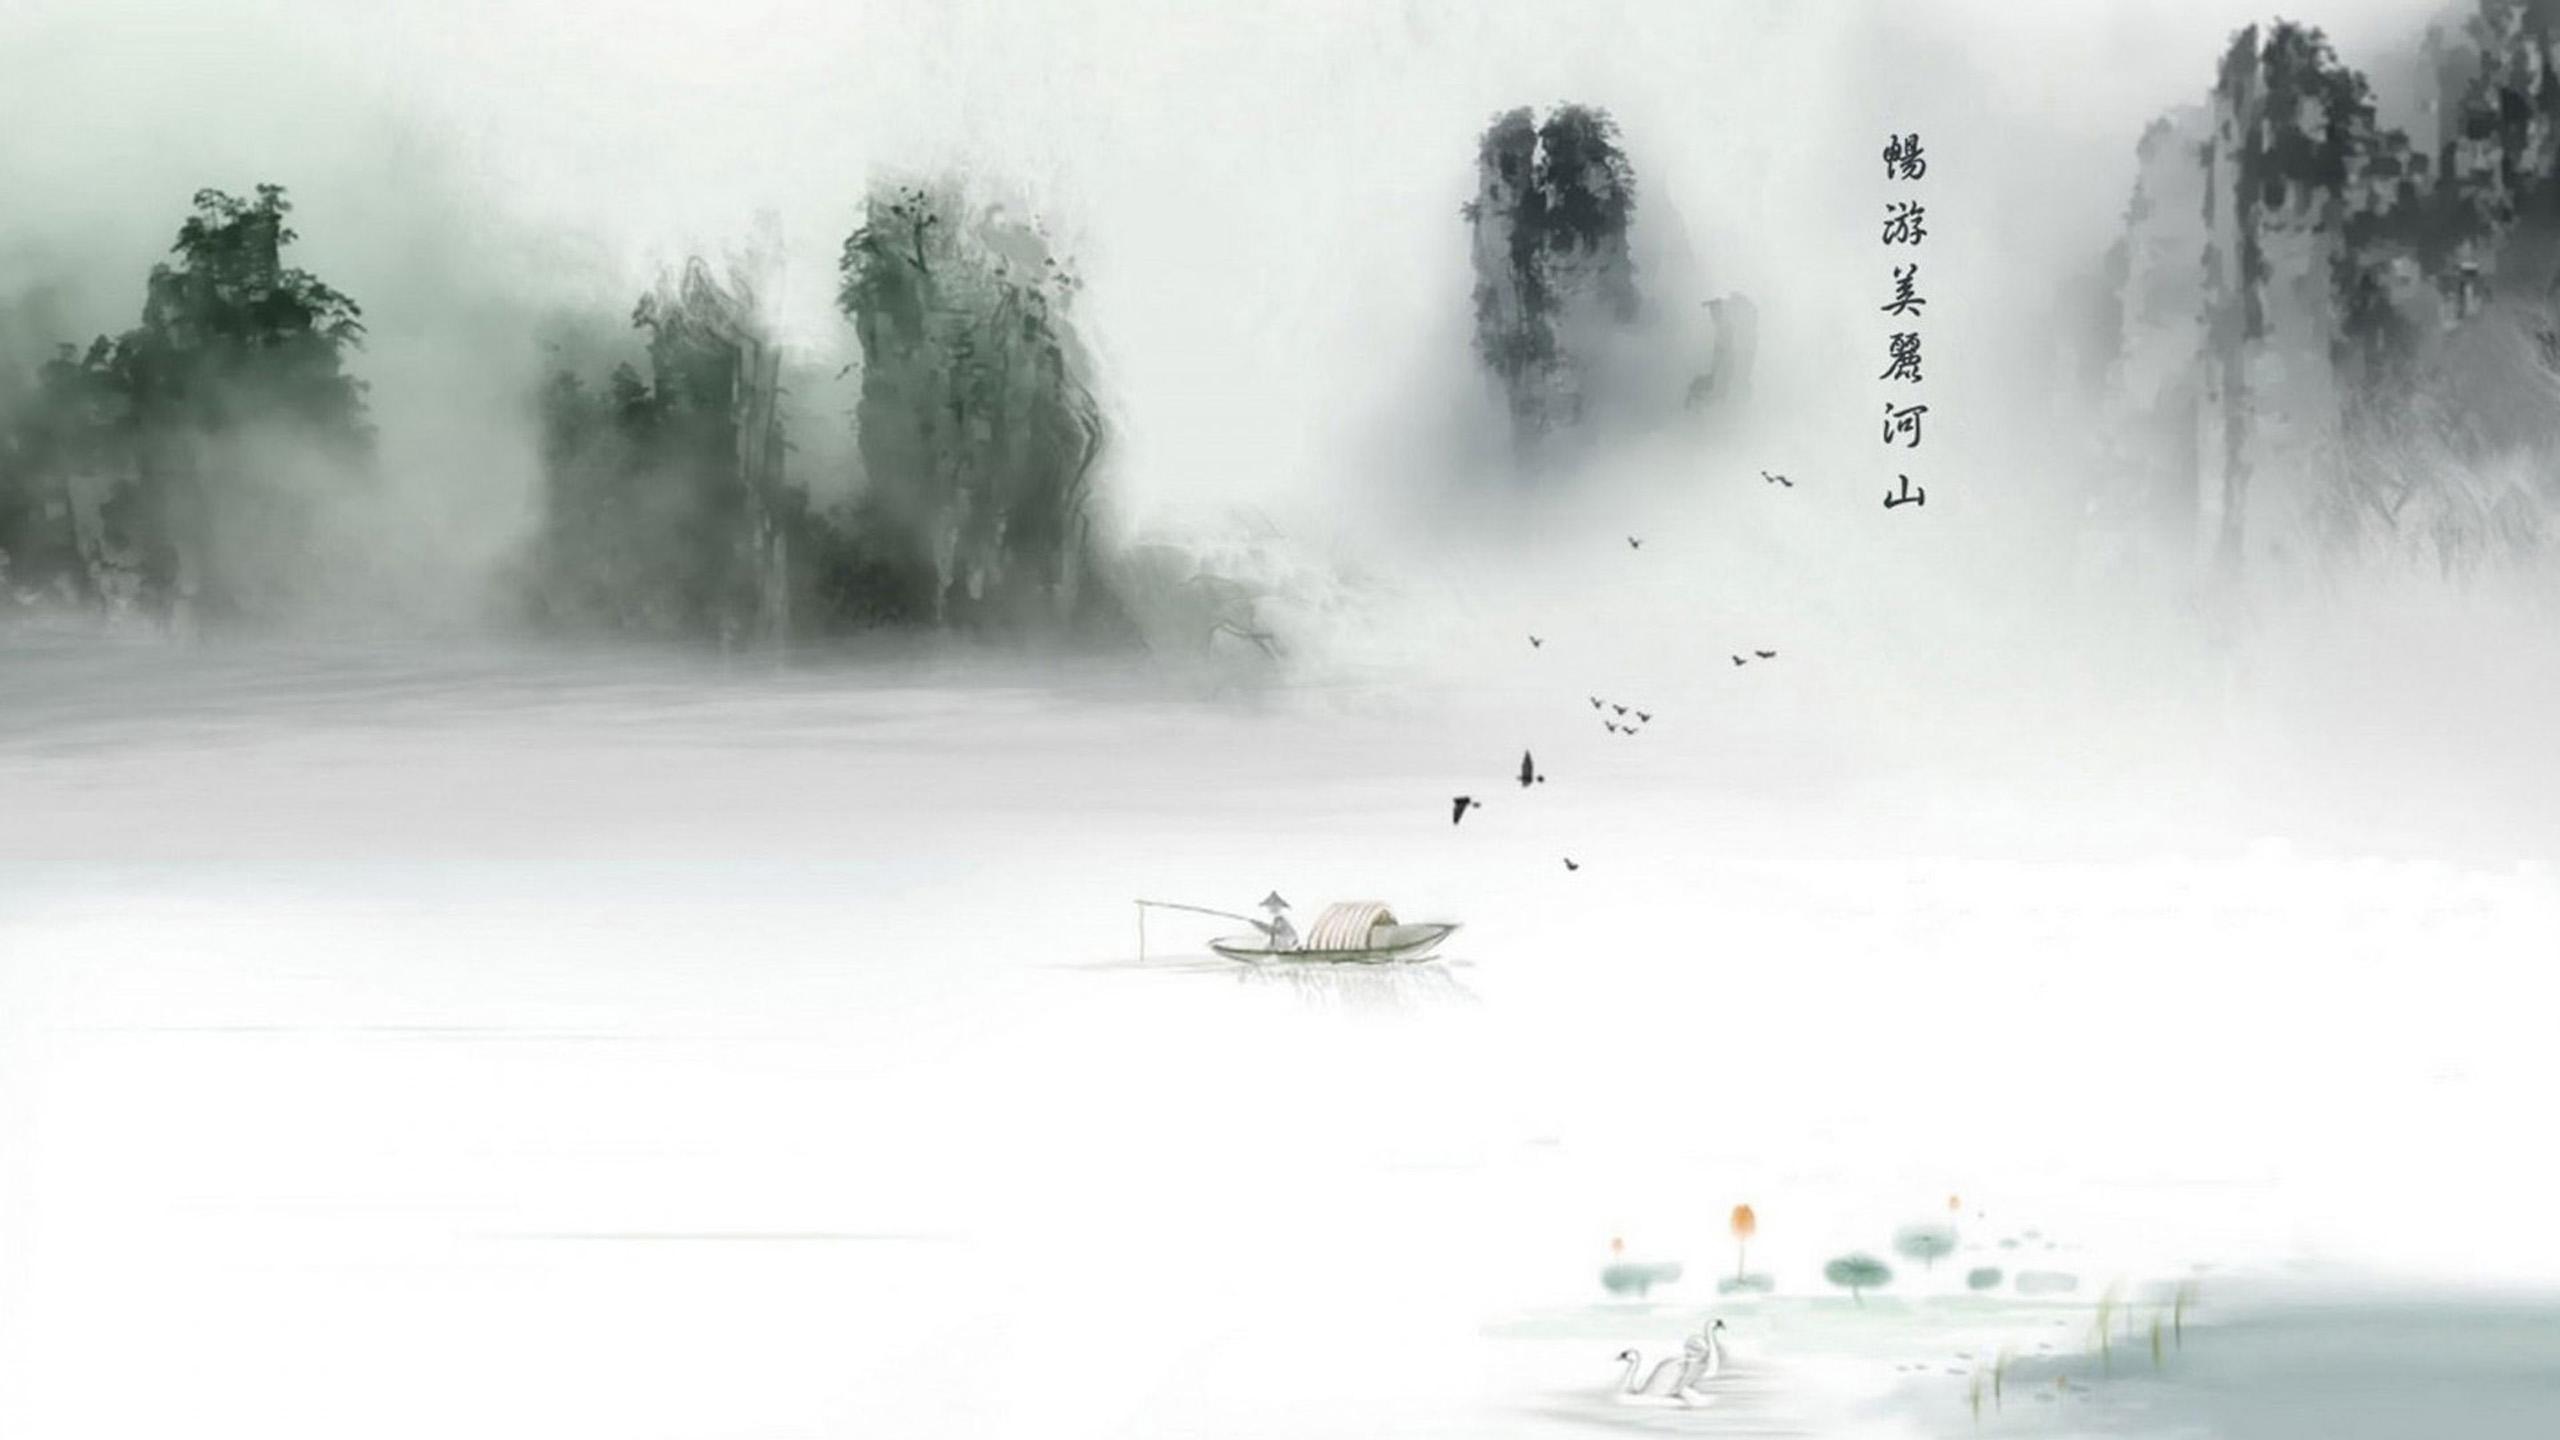 chinese garden wallpaper in hd - photo #43